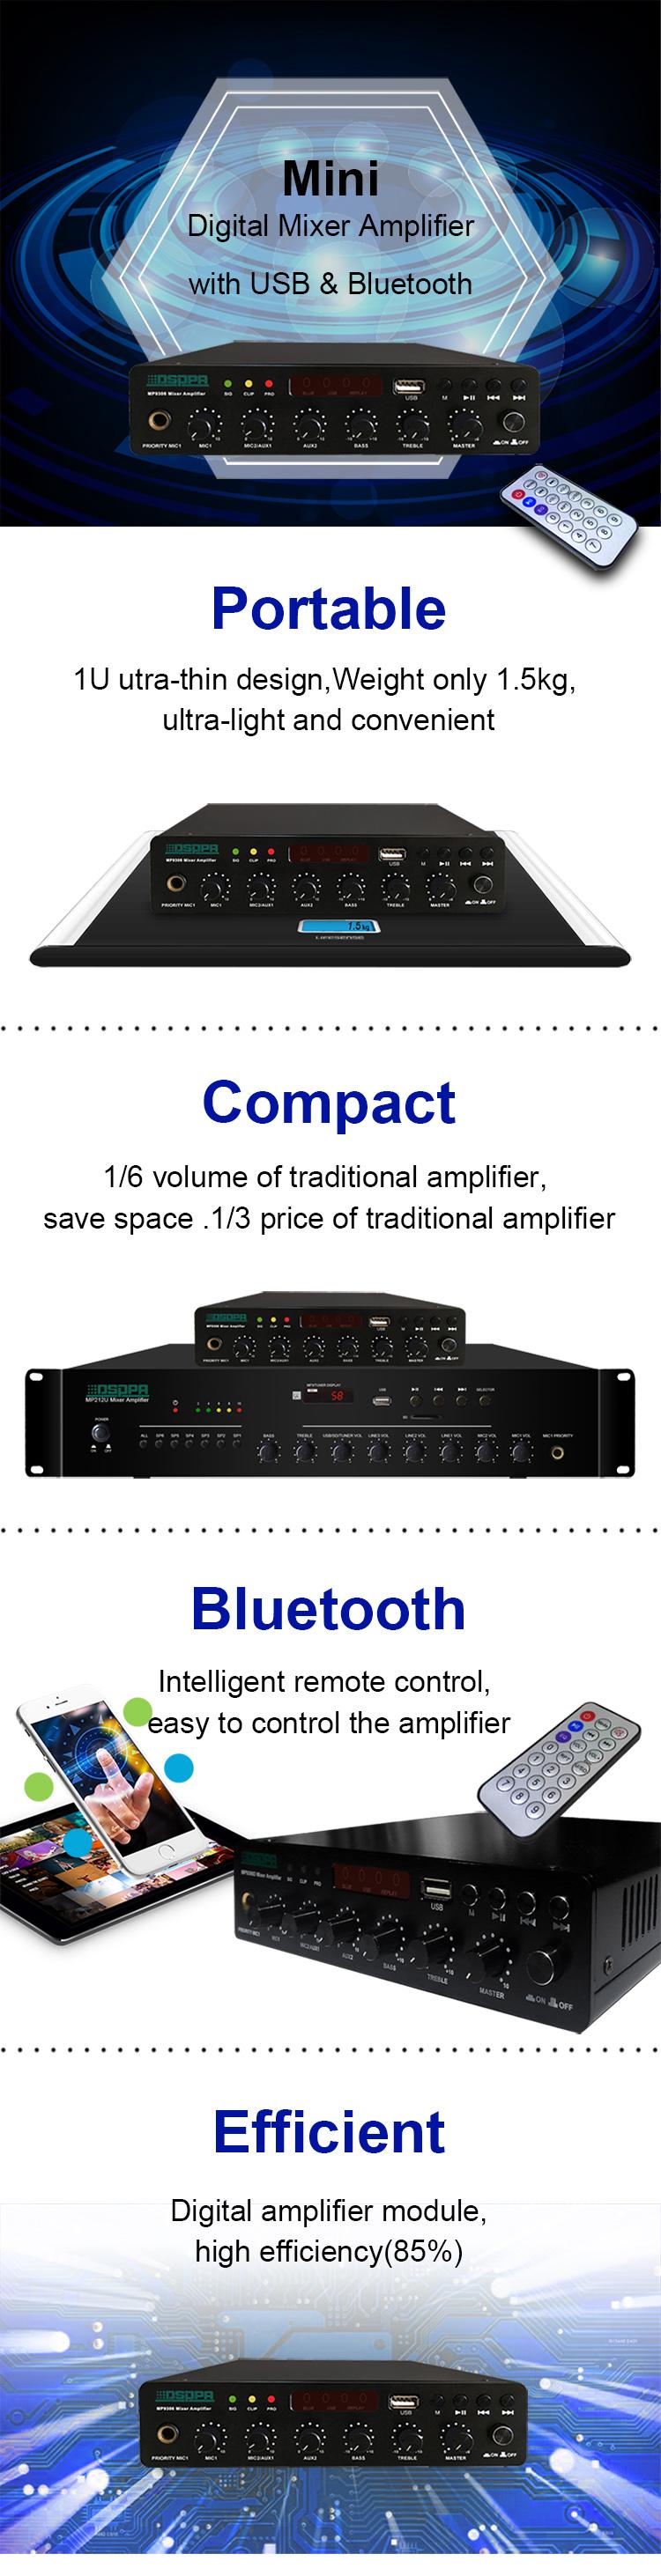 MP9306U 60W Ultra-thin Digital Mixer Amplifier